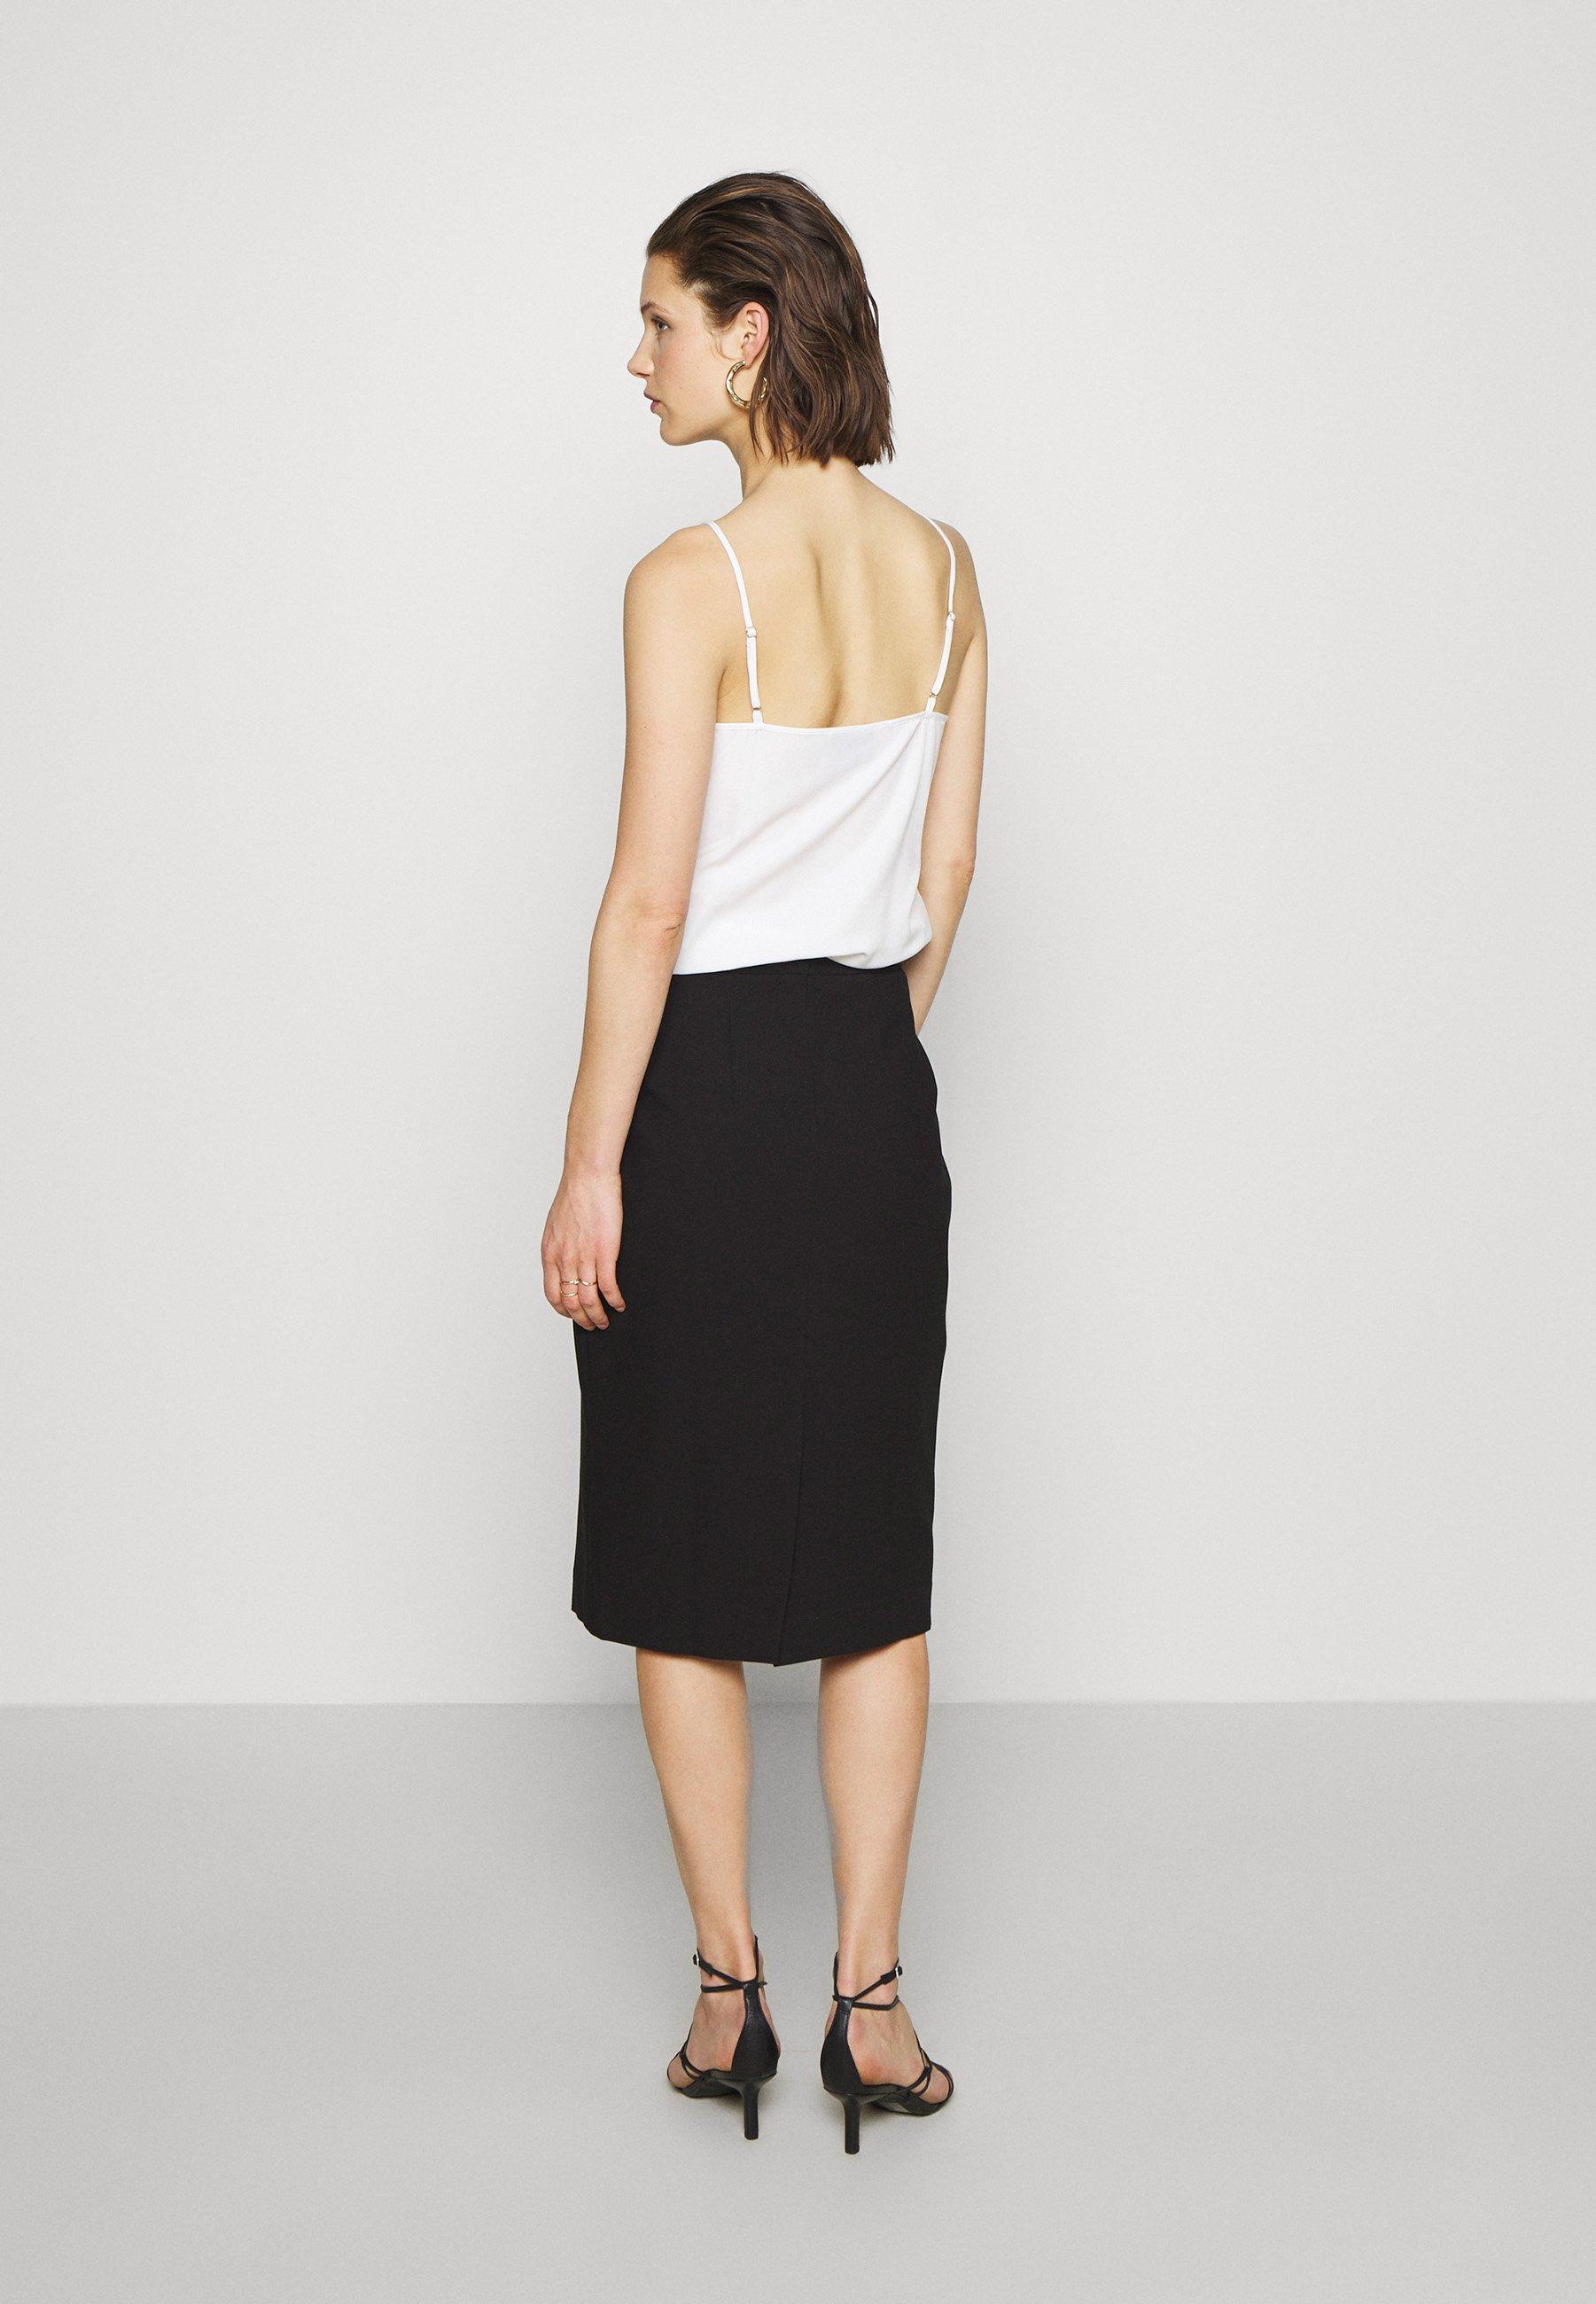 Big Discount Women's Clothing IVY & OAK PENCIL SKIRT Pencil skirt black vZik98ZFZ